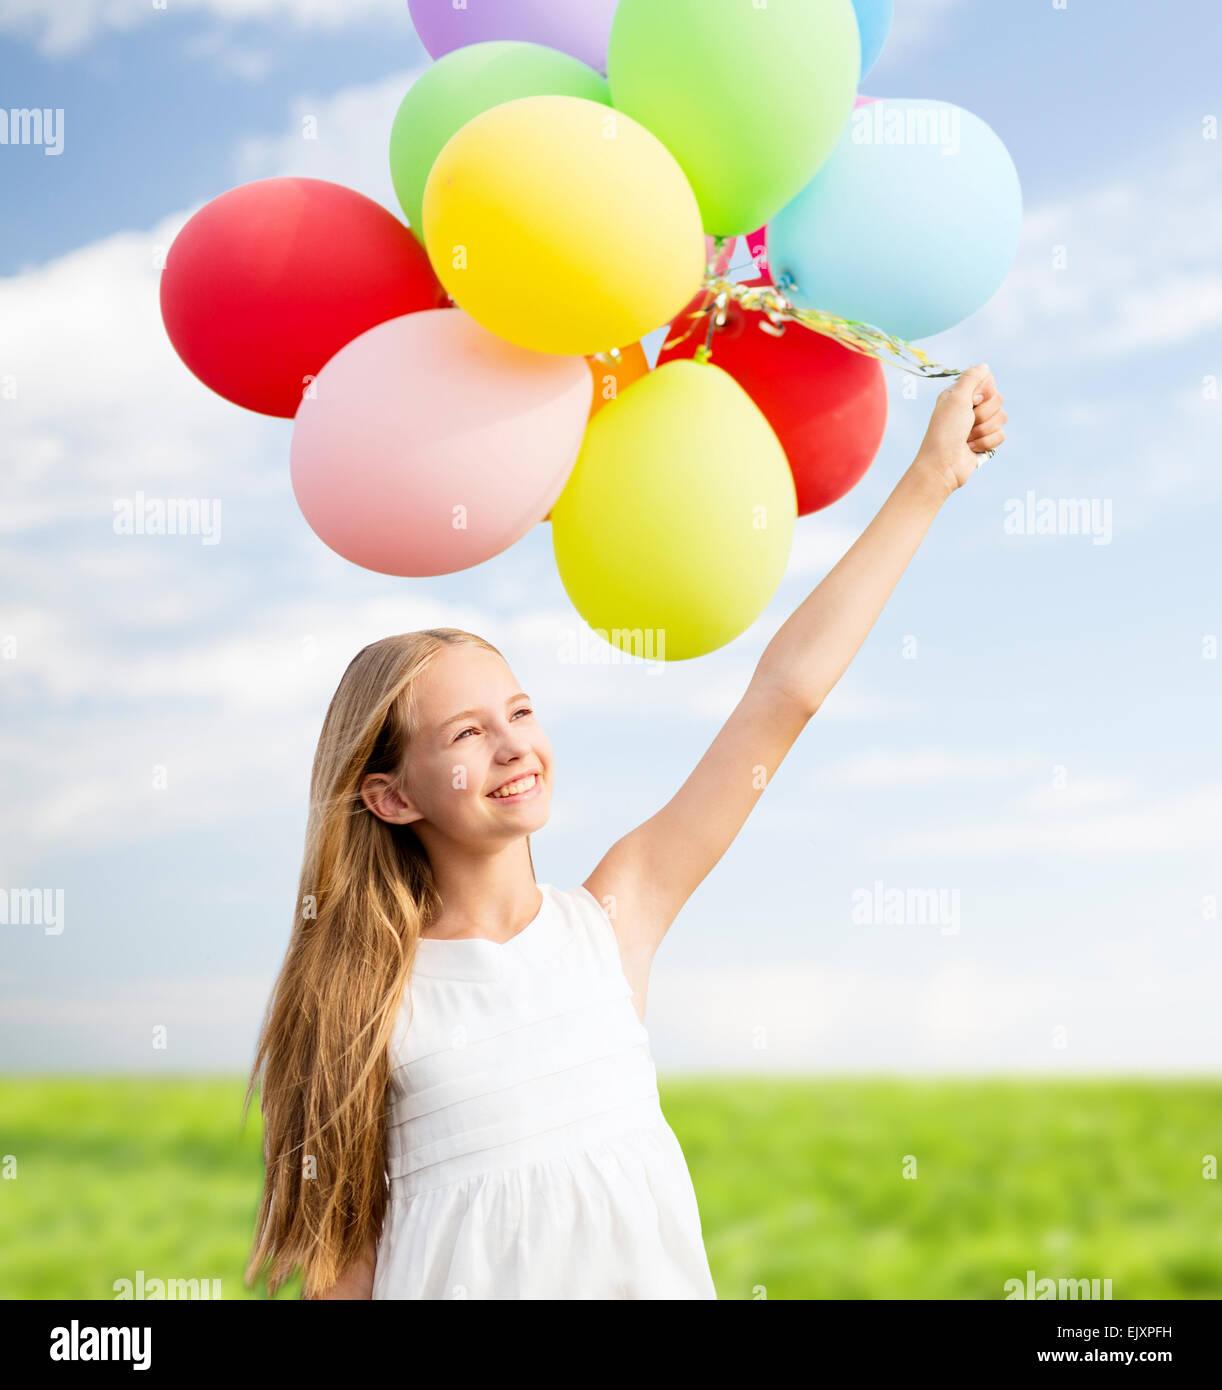 Glückliches Mädchen Mit Bunten Luftballons Stockfoto, Bild